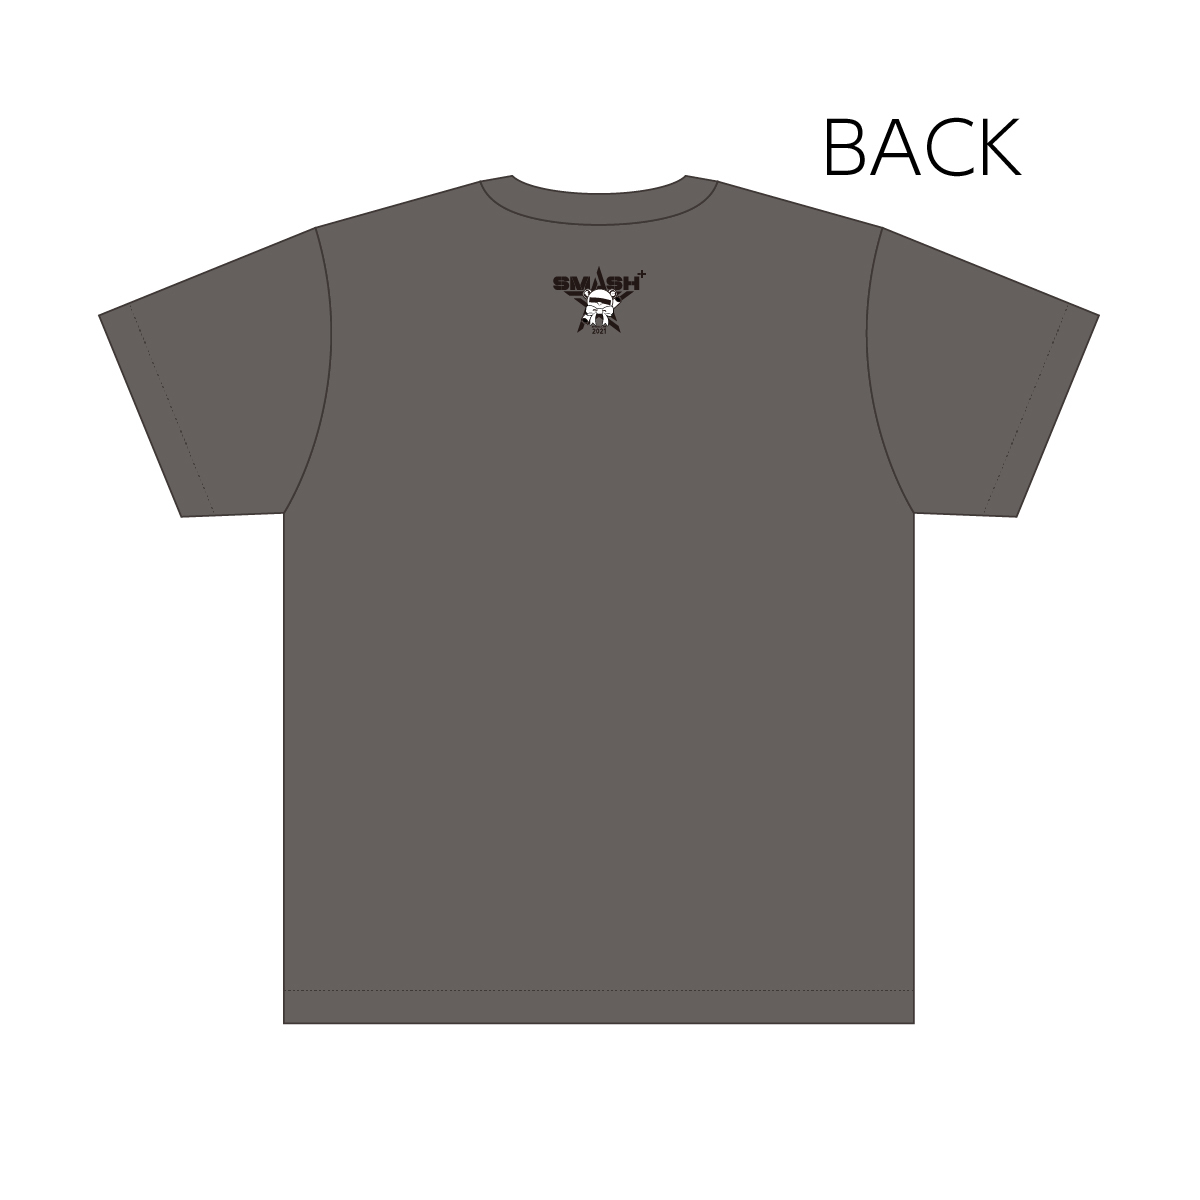 『TFGSPECIALLIVE2021-SMASH+-』Tシャツ